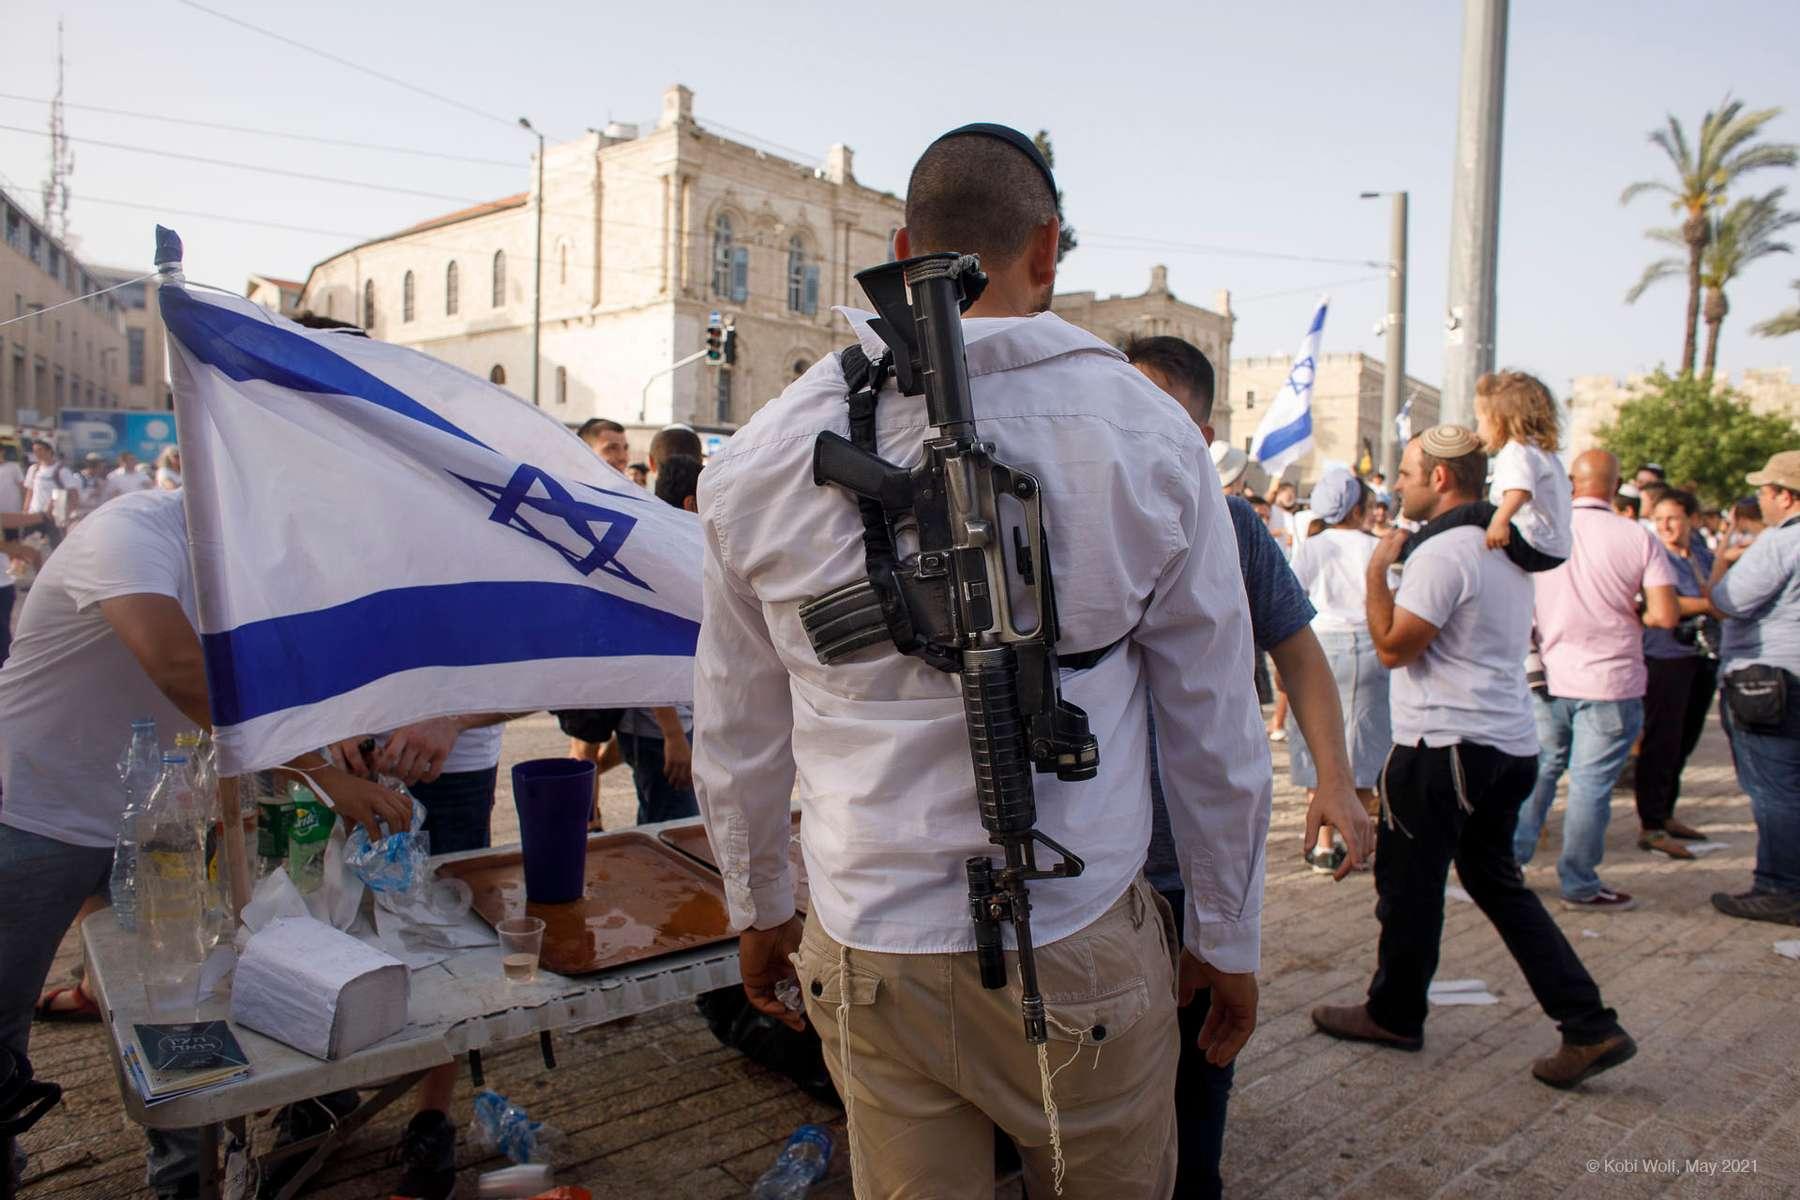 Israelis march with national flags celebrating the Jerusalem liberation day in Jerusalem May 10 2021 photographer : Kobi Wolf